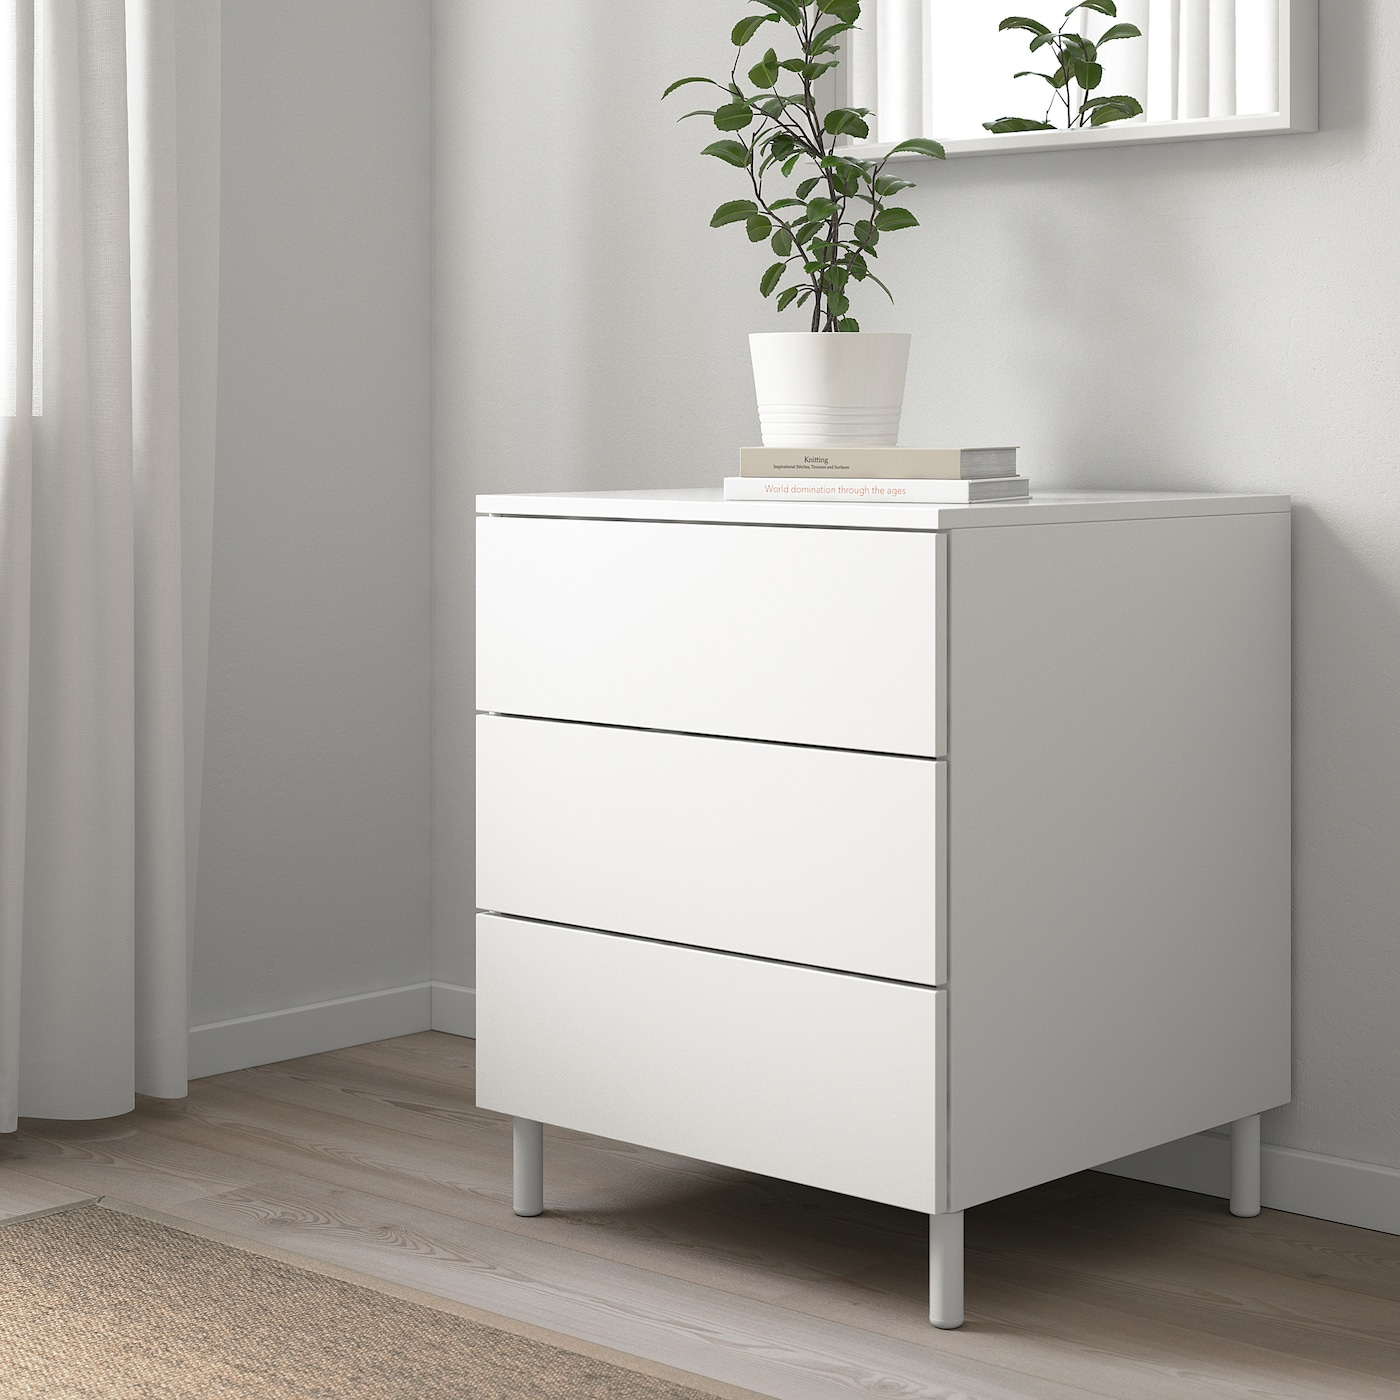 PLATSA Komoda s 3 zásuvkami, biela/Fonnes biela, 60x57x73 cm